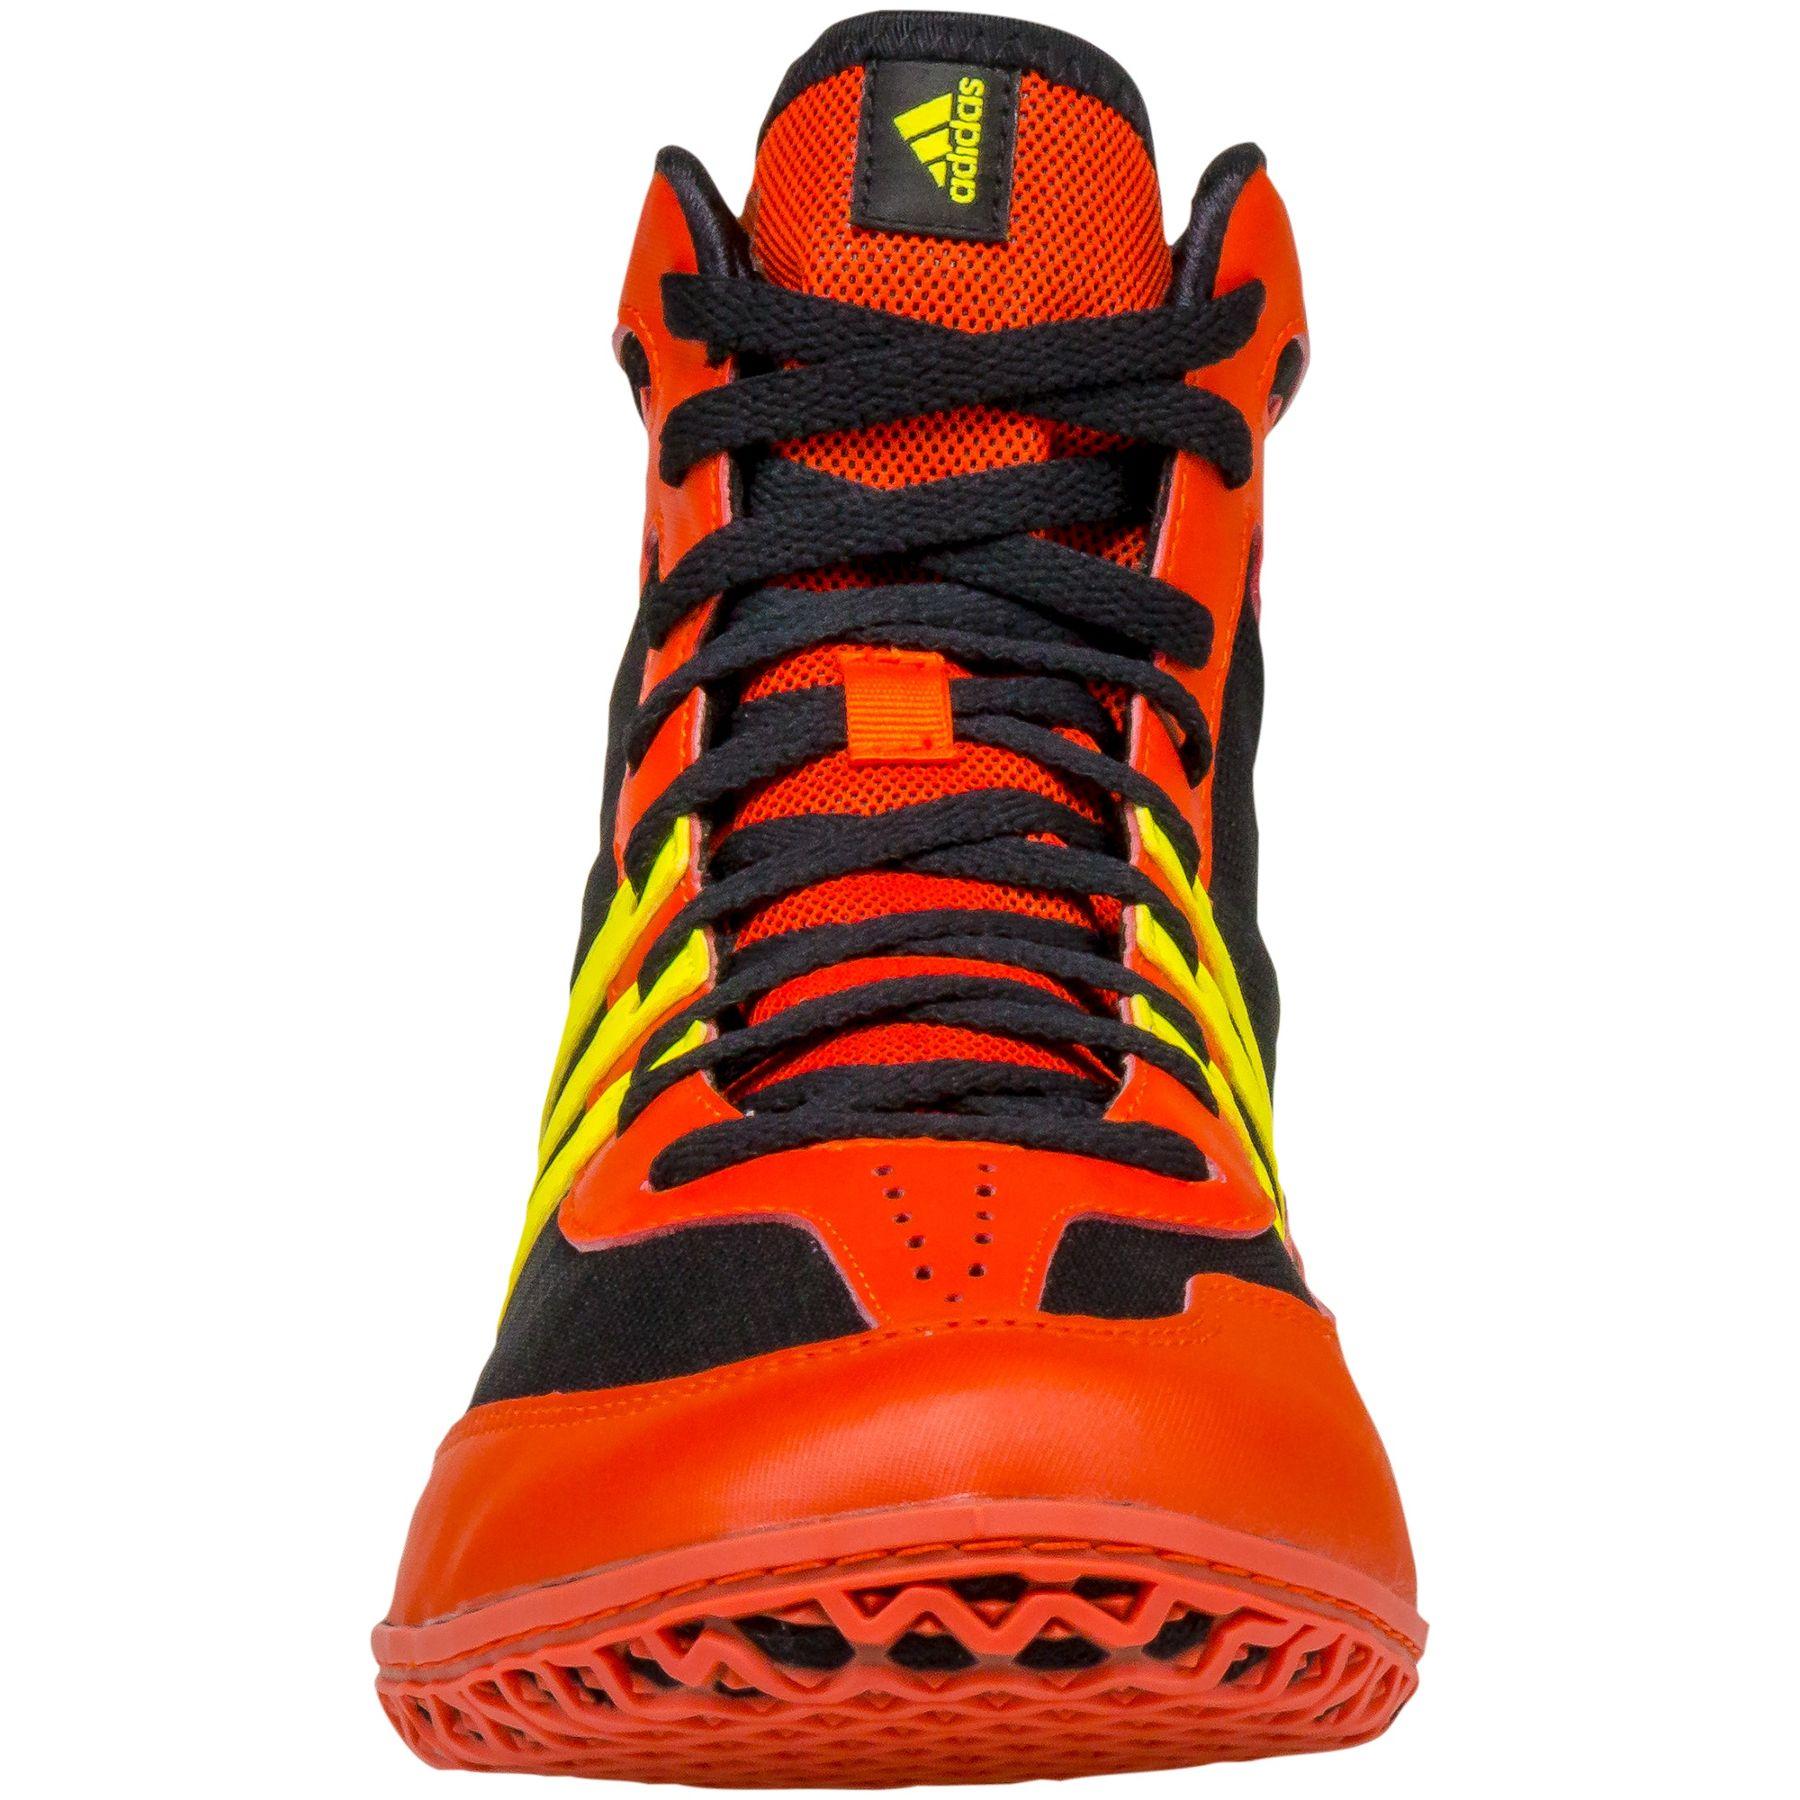 ae8b927c8b3 Adidas Mat Wizard 3 Youth Wrestling Shoe Red